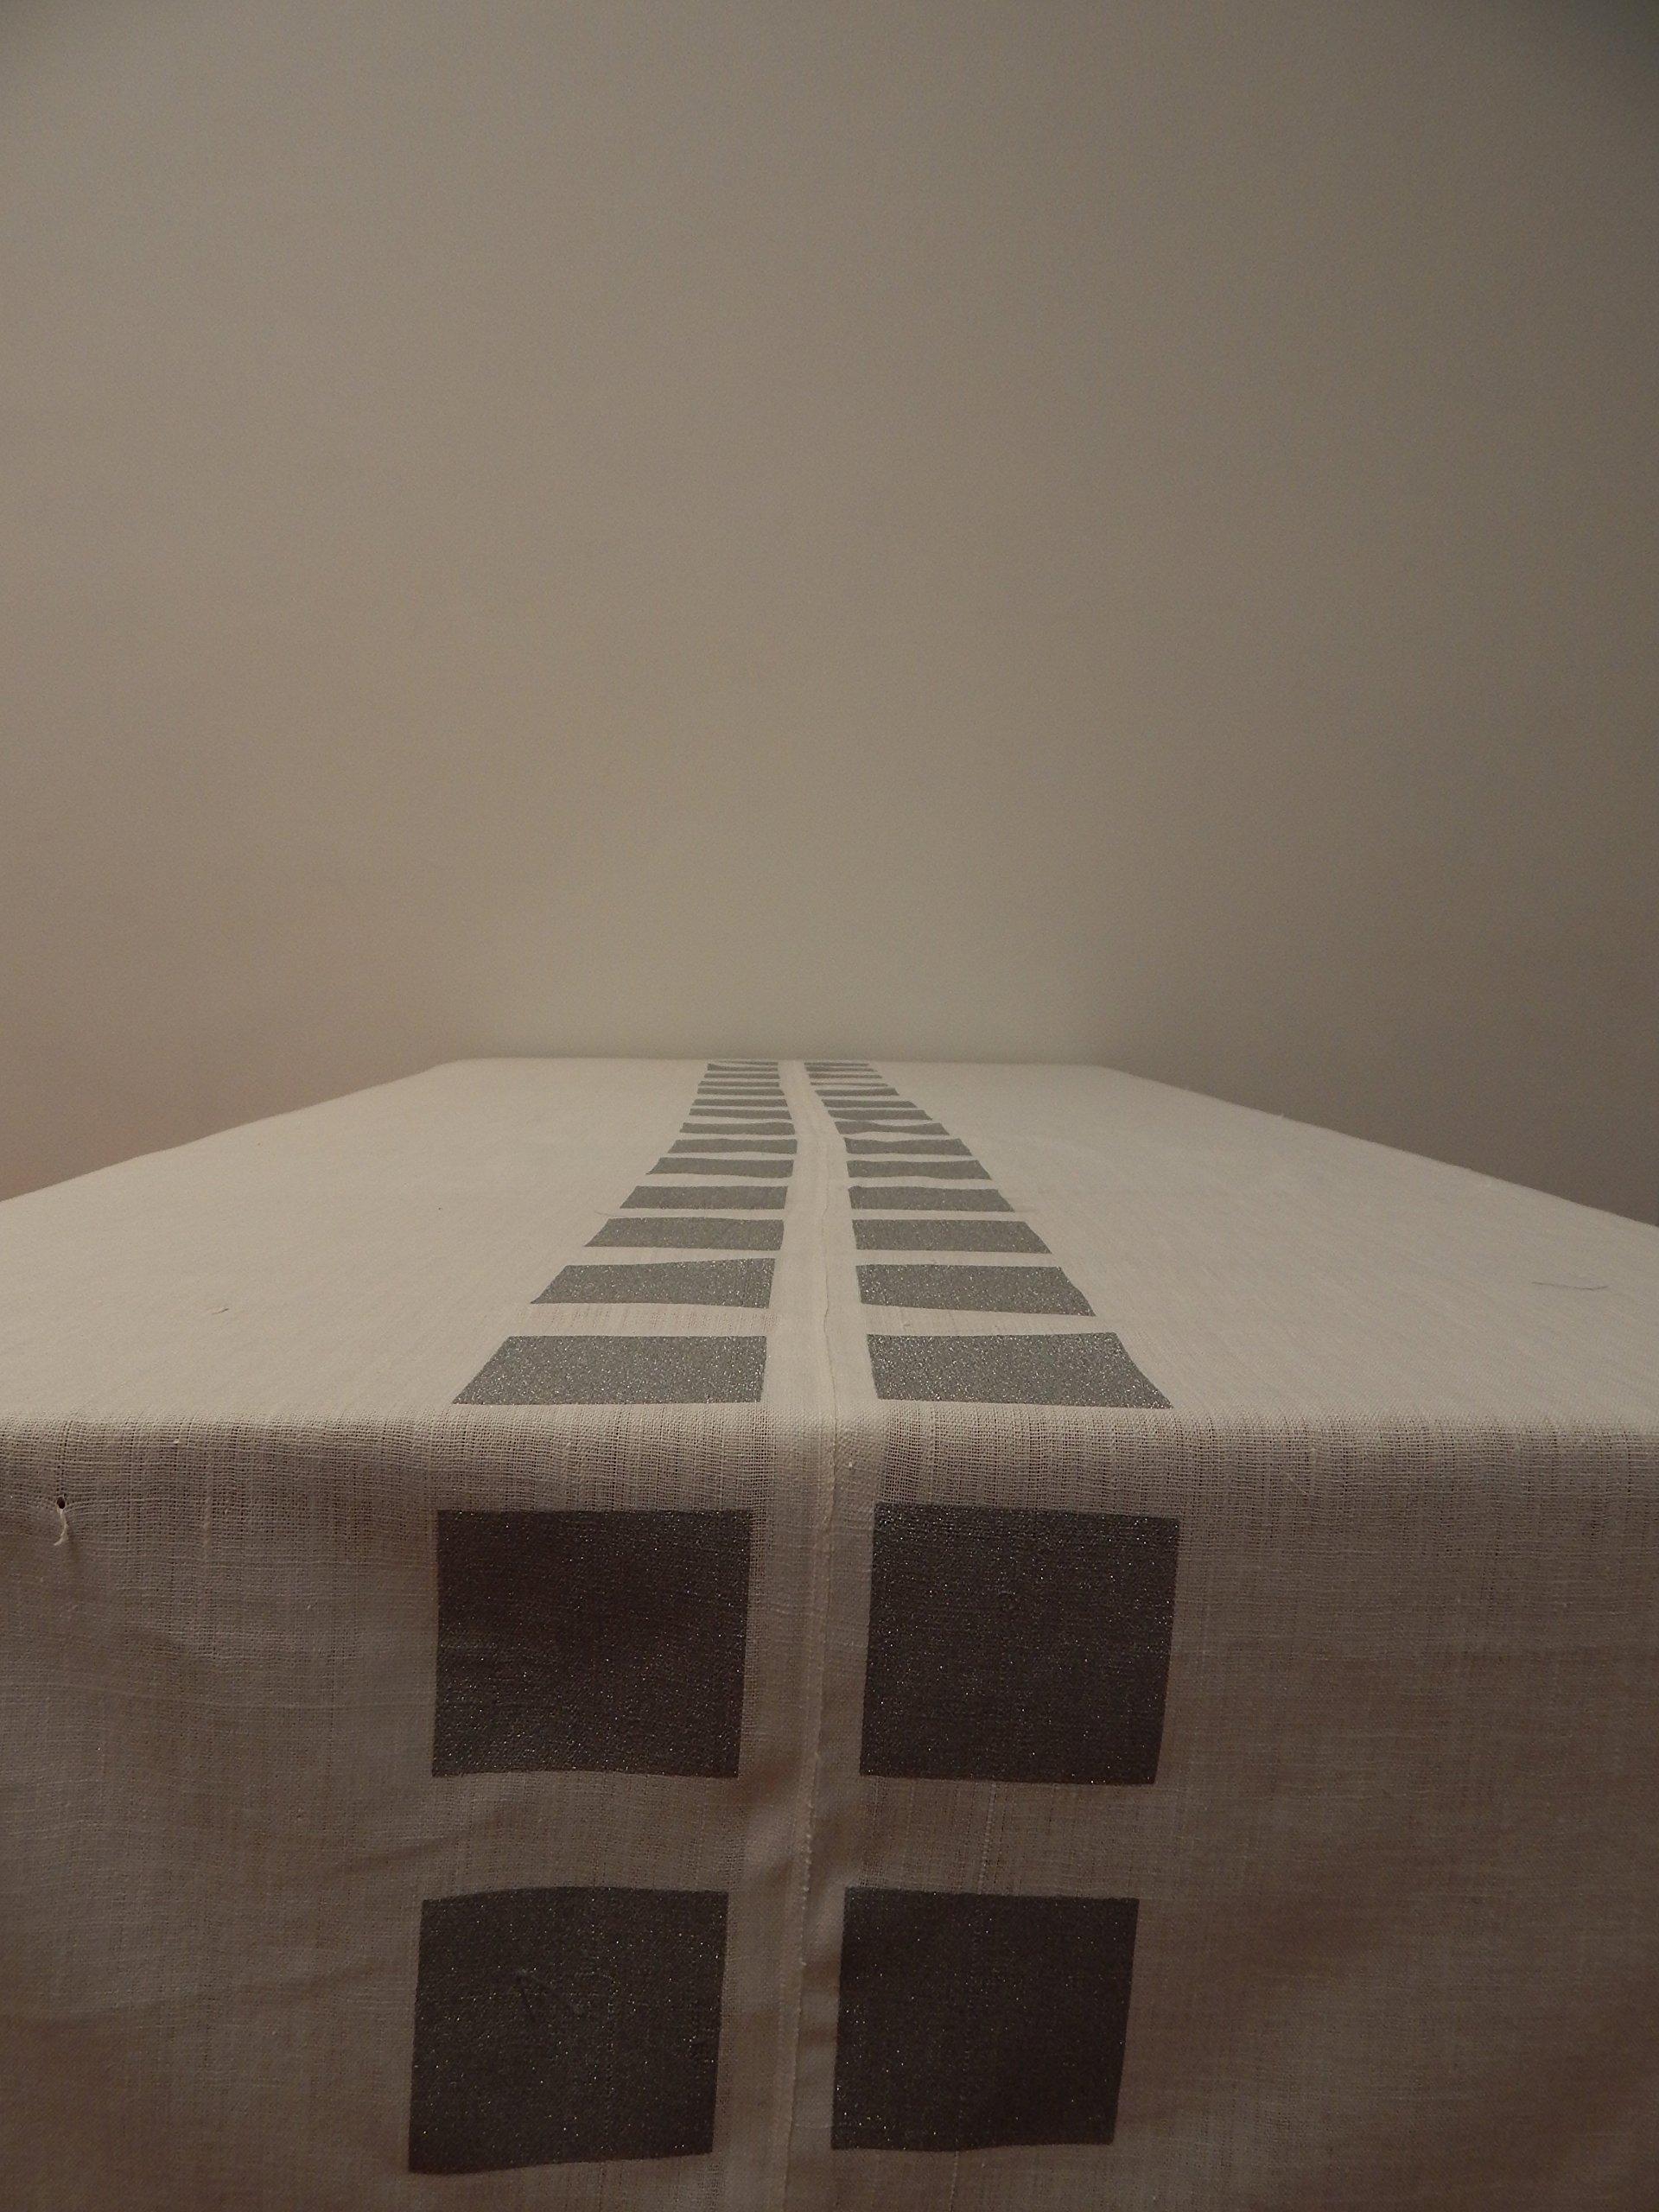 Gitika Goyal Home Cotton Khadi Silver Screen Printed Tablecloth with Square Design, White, 60'' x 90''